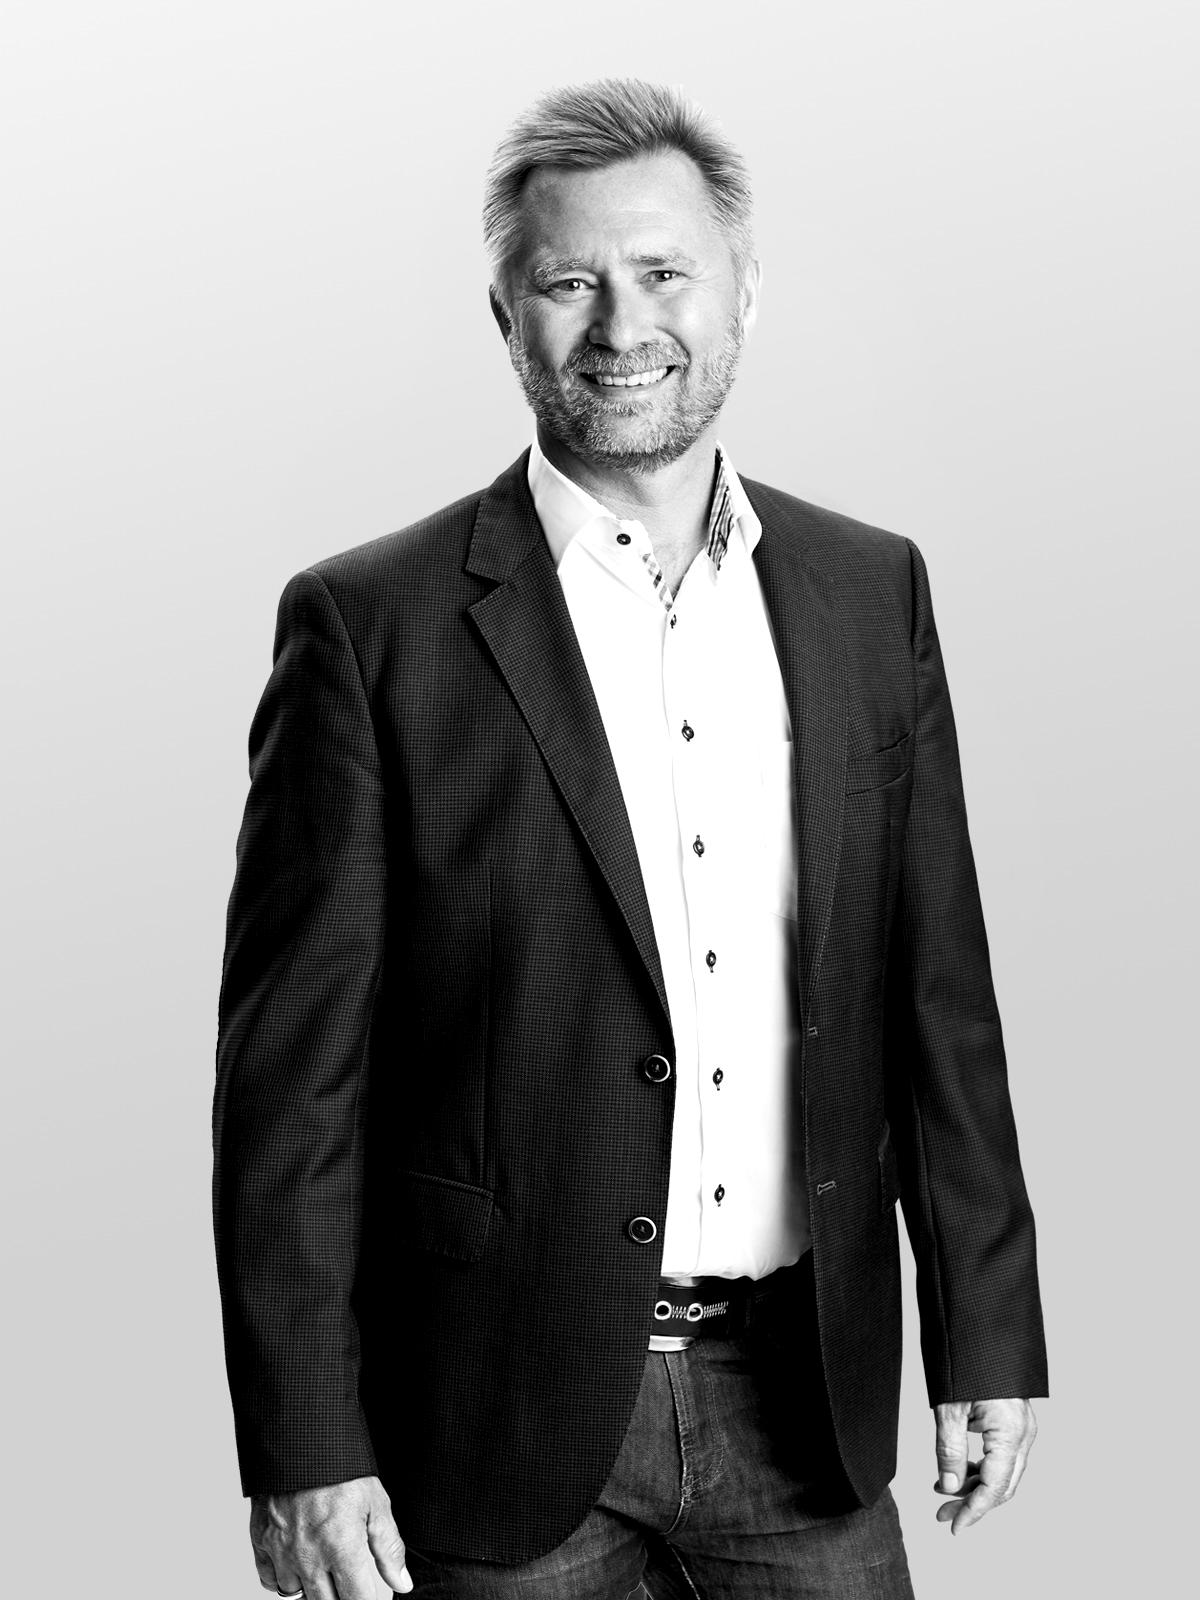 Henrik Smit